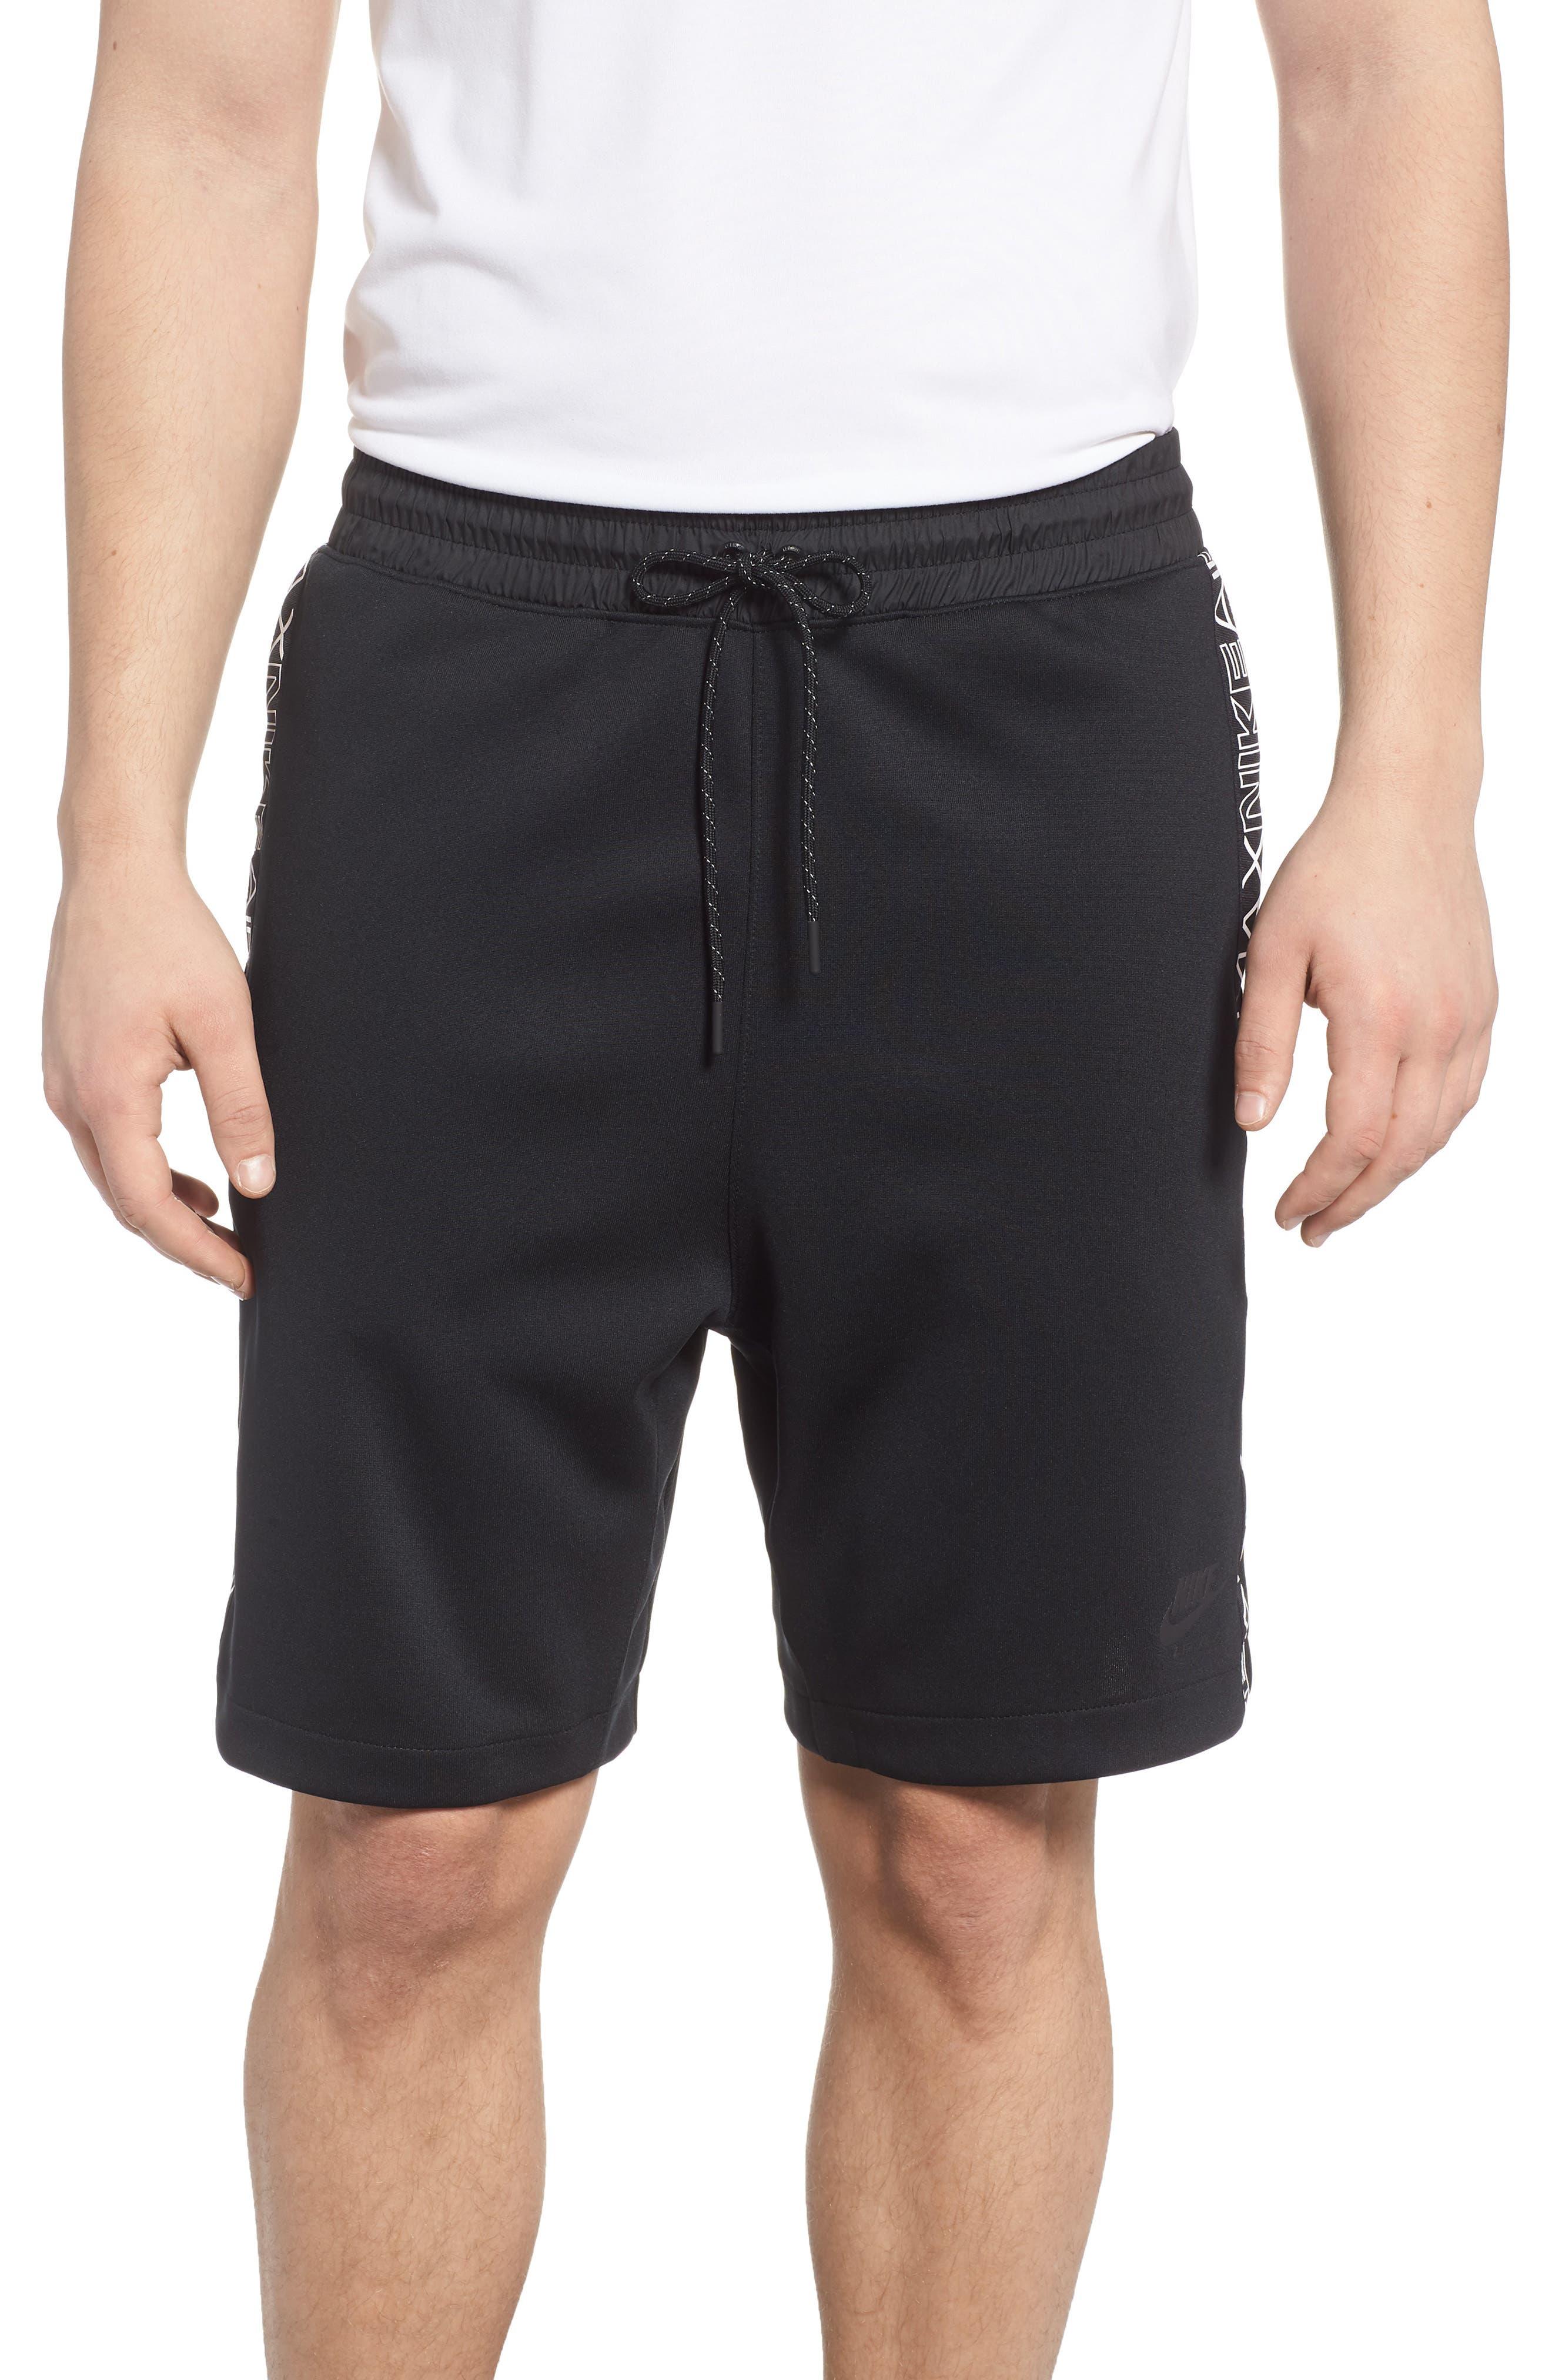 Sportswear Air Max Shorts,                             Main thumbnail 1, color,                             010